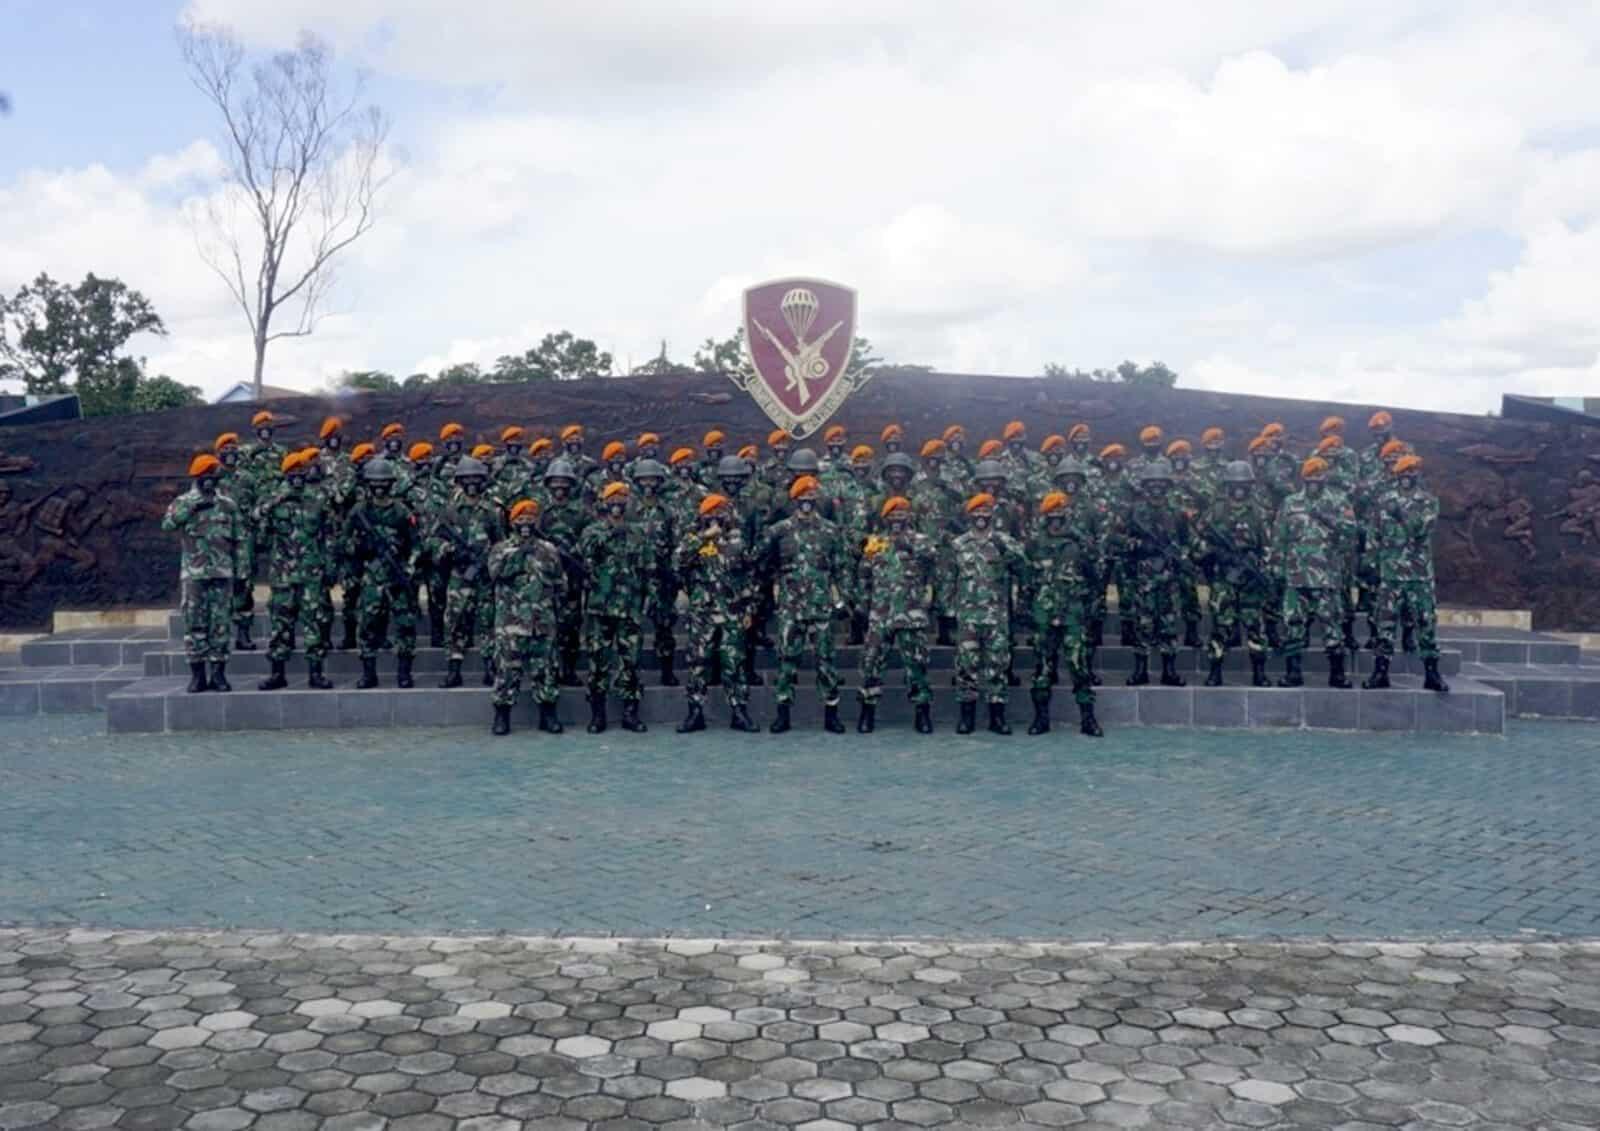 Pembukaan Orientasi Prajurit Baru Batalyon Komando 462 Paskhas